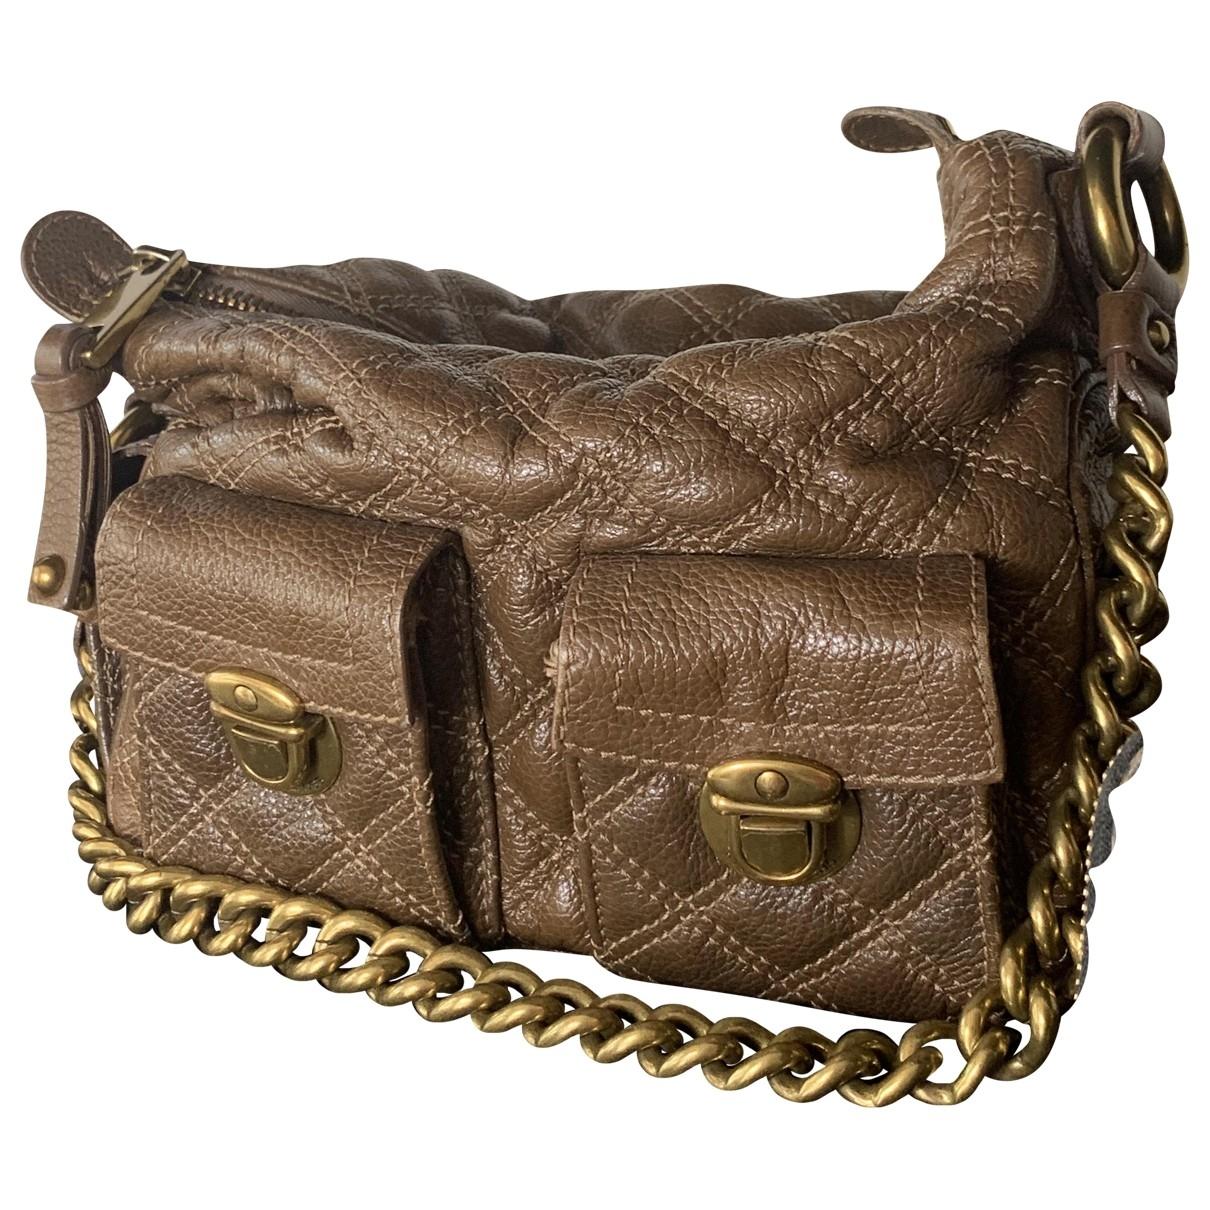 Marc Jacobs \N Brown Leather handbag for Women \N